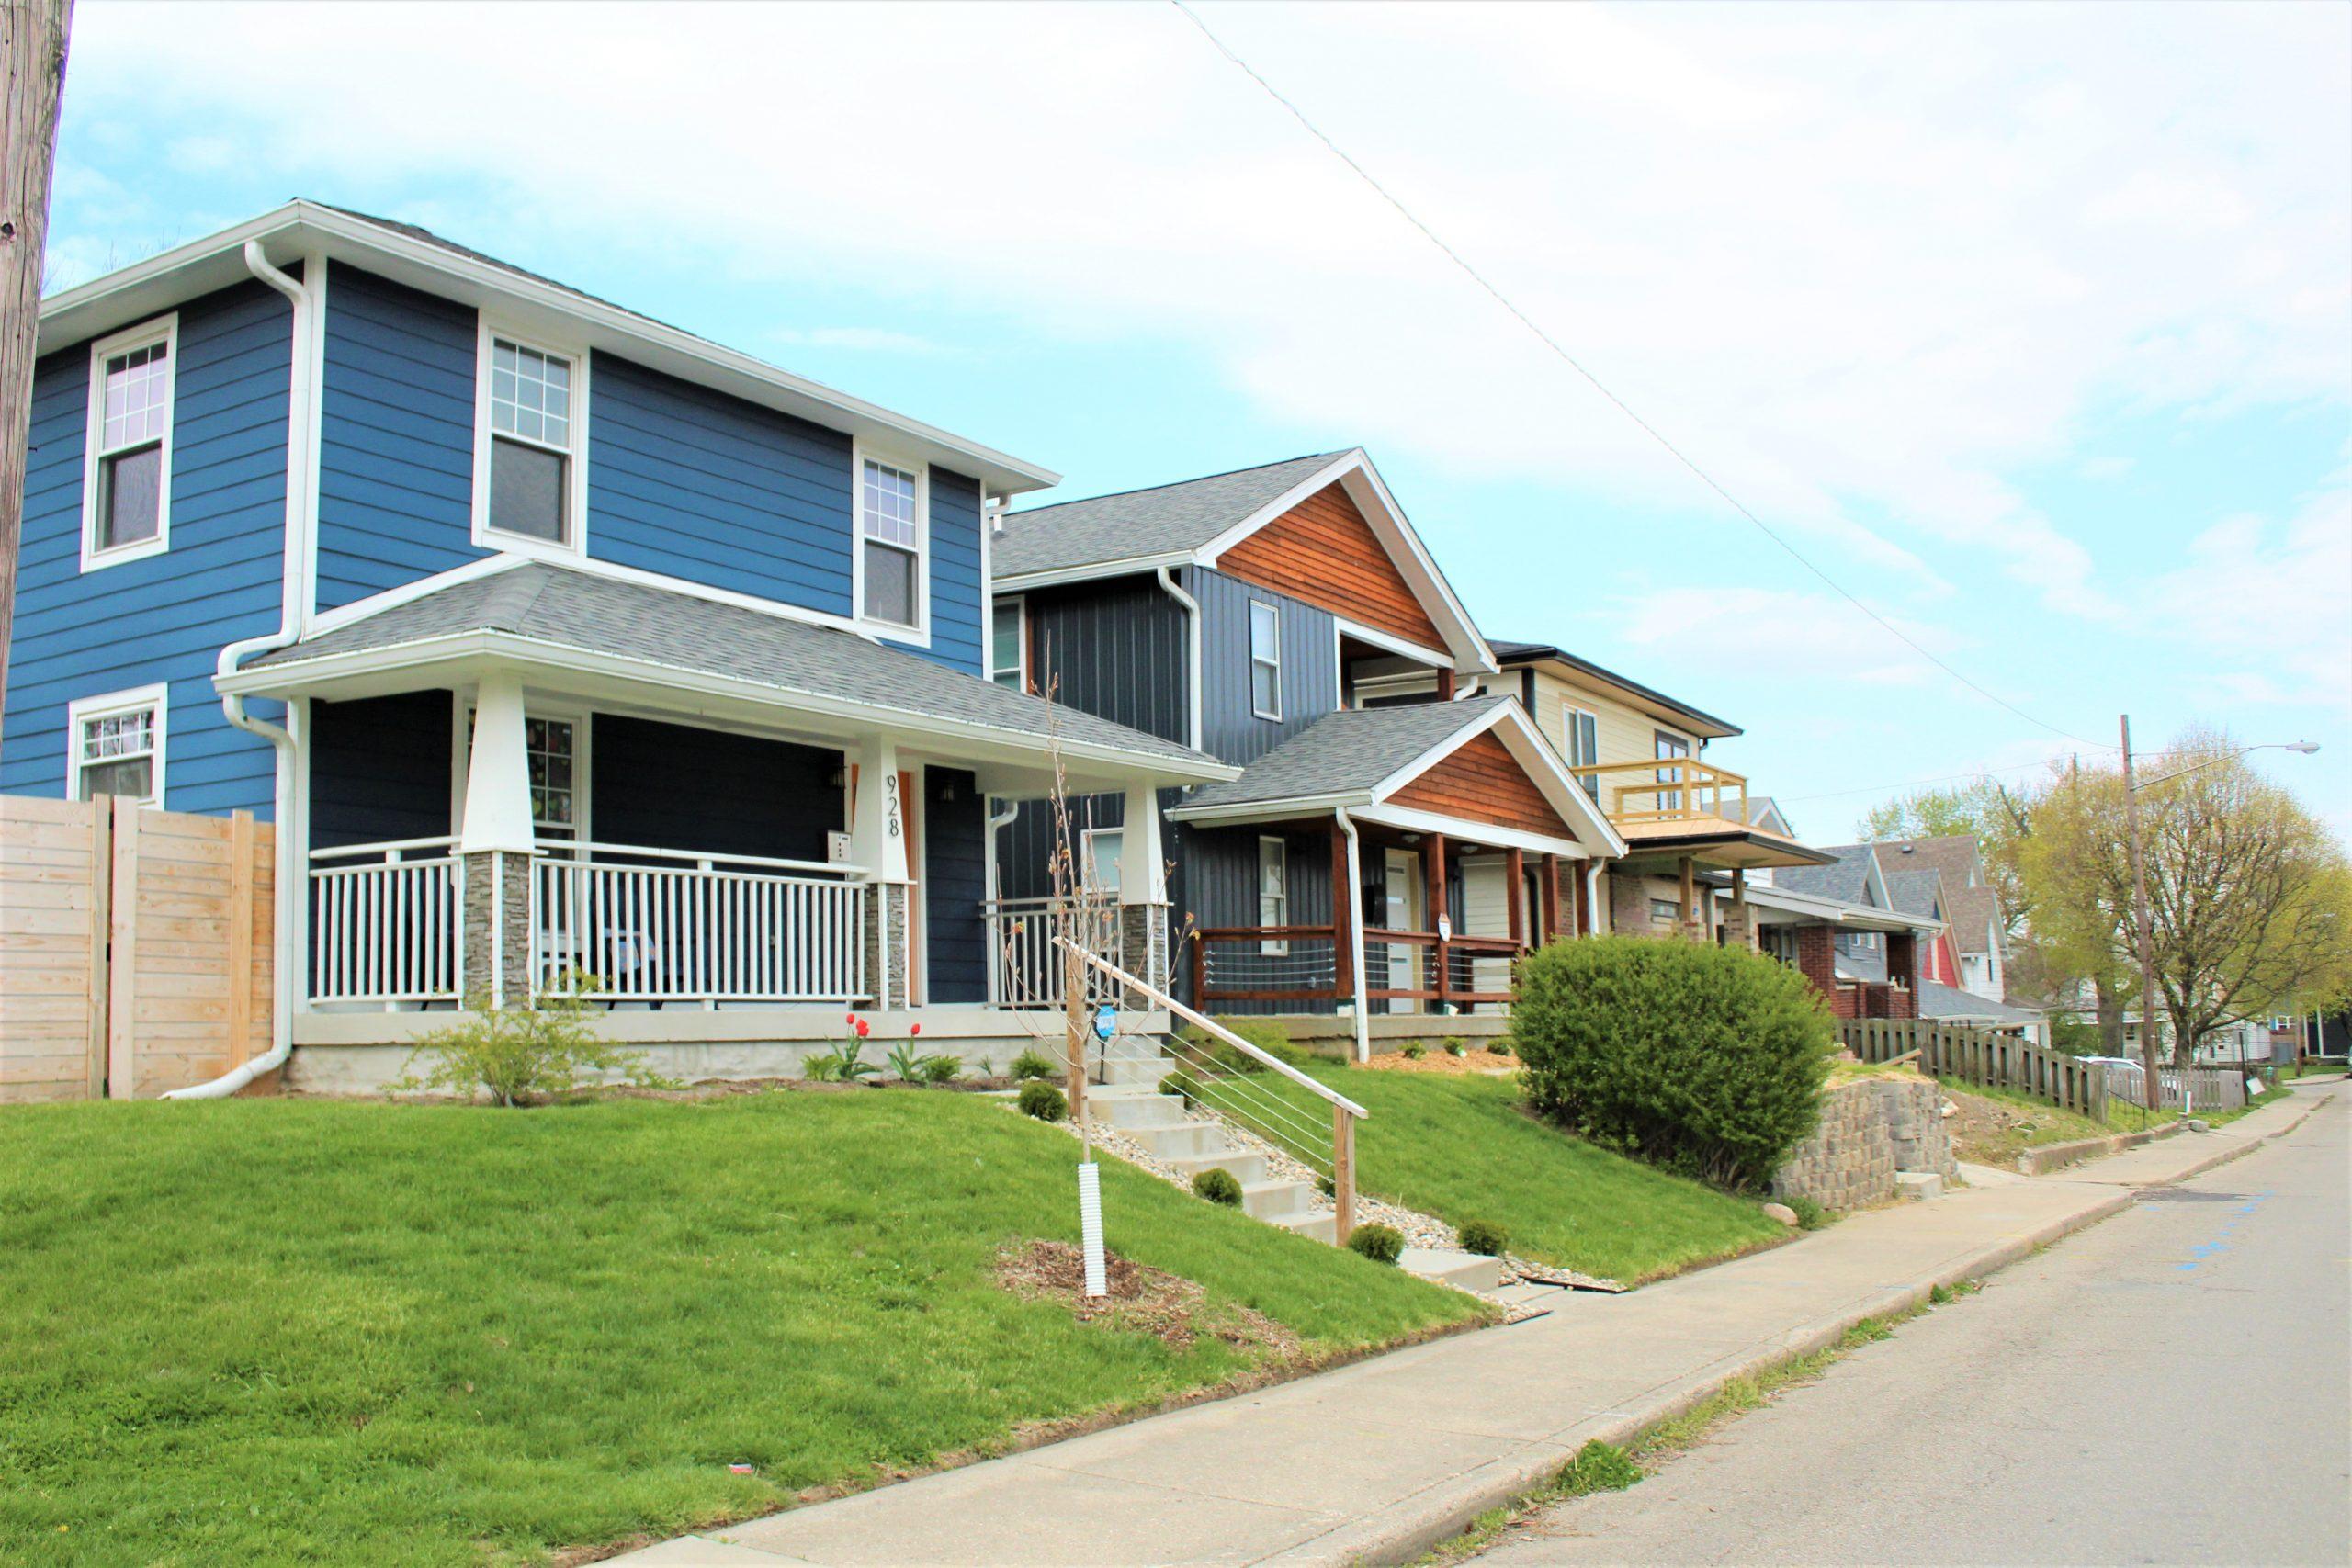 Renovated Homes in Bates Hendricks